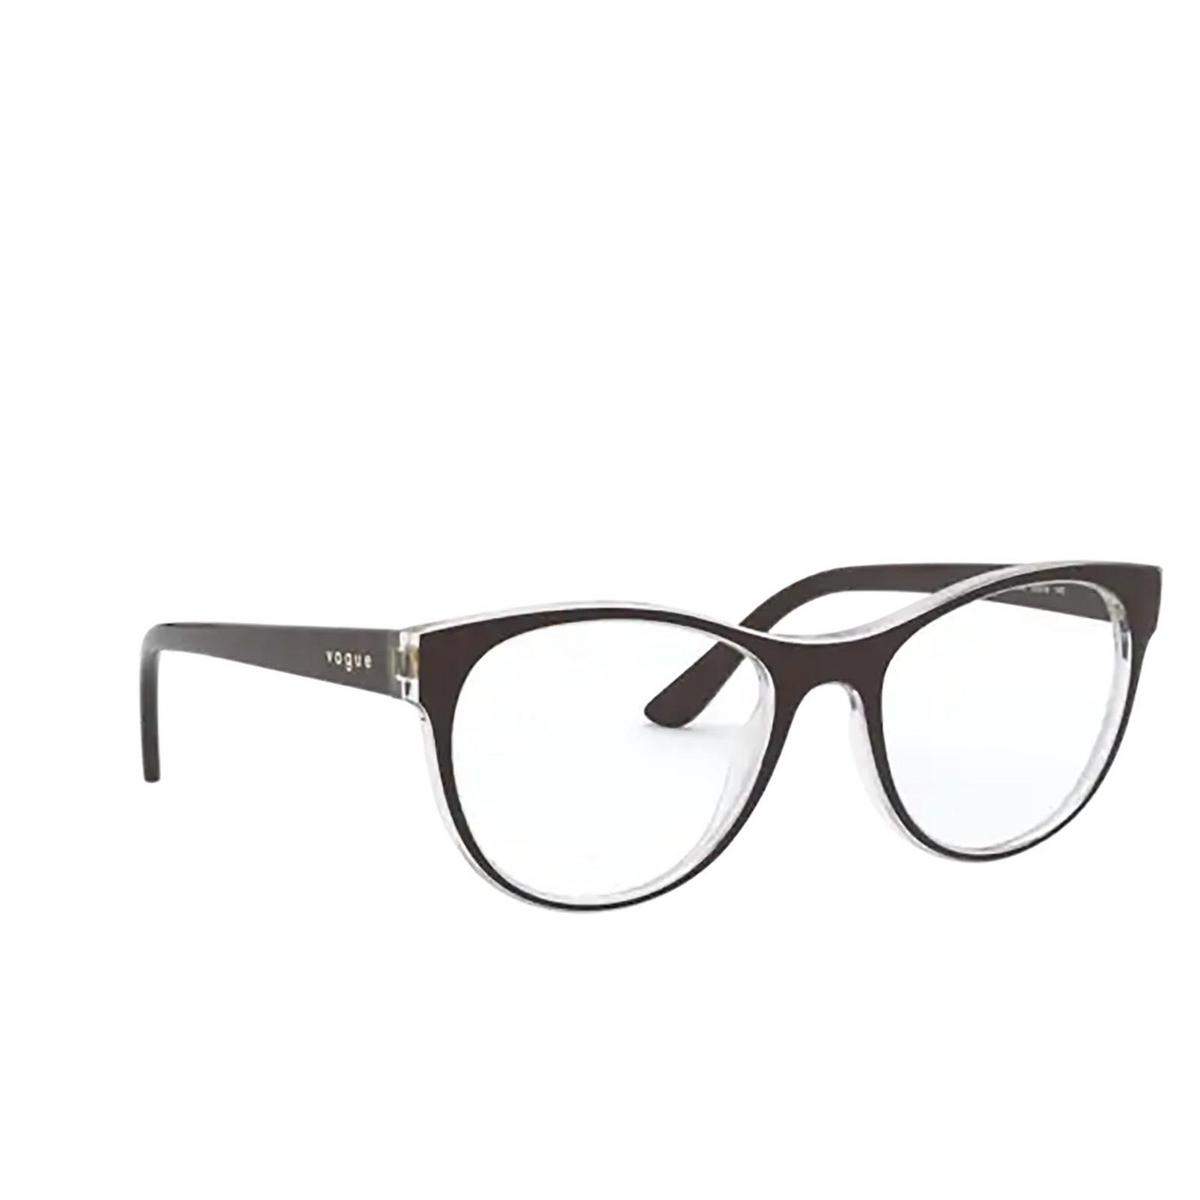 Vogue® Cat-eye Eyeglasses: VO5336 color Top Brown / Serigraphy 2842.